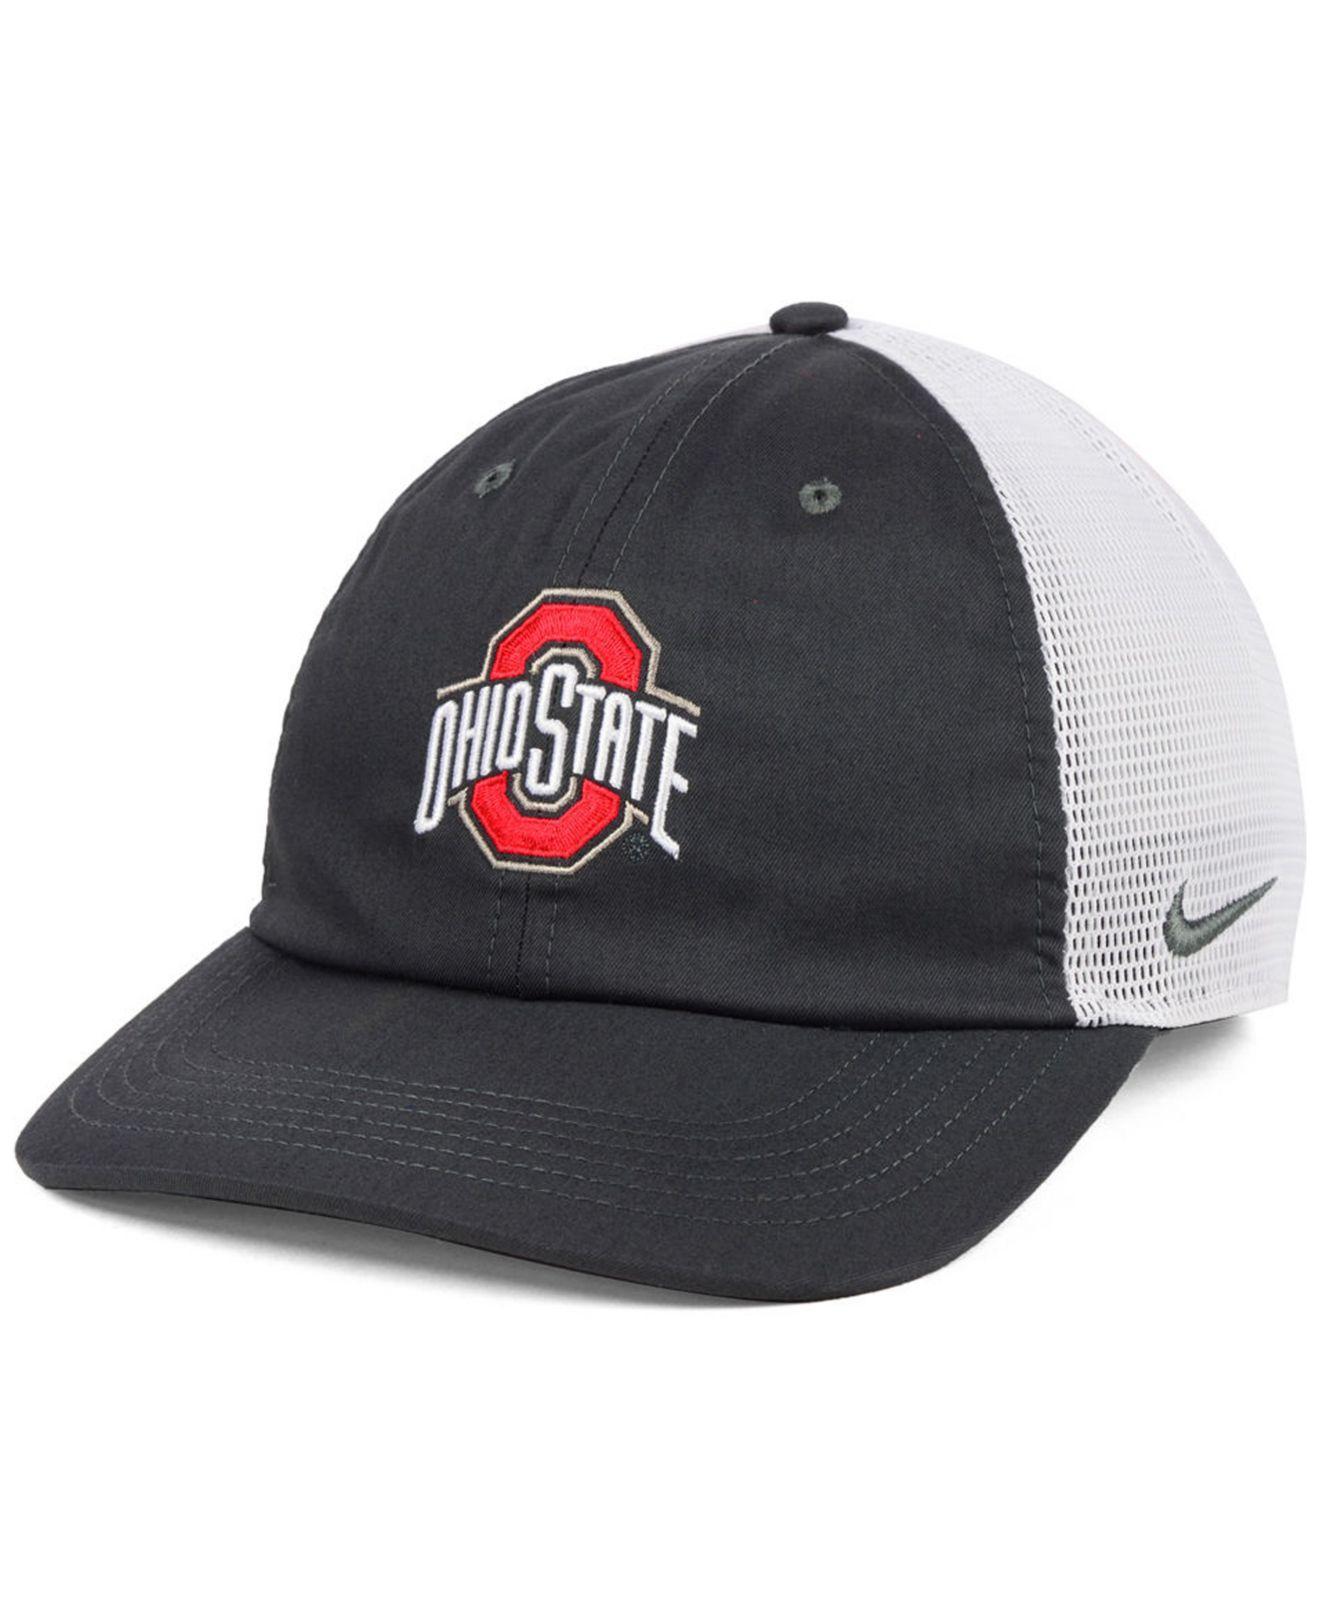 new arrival c6092 956fc Nike. Men s Ohio State Buckeyes H86 Trucker Snapback Cap